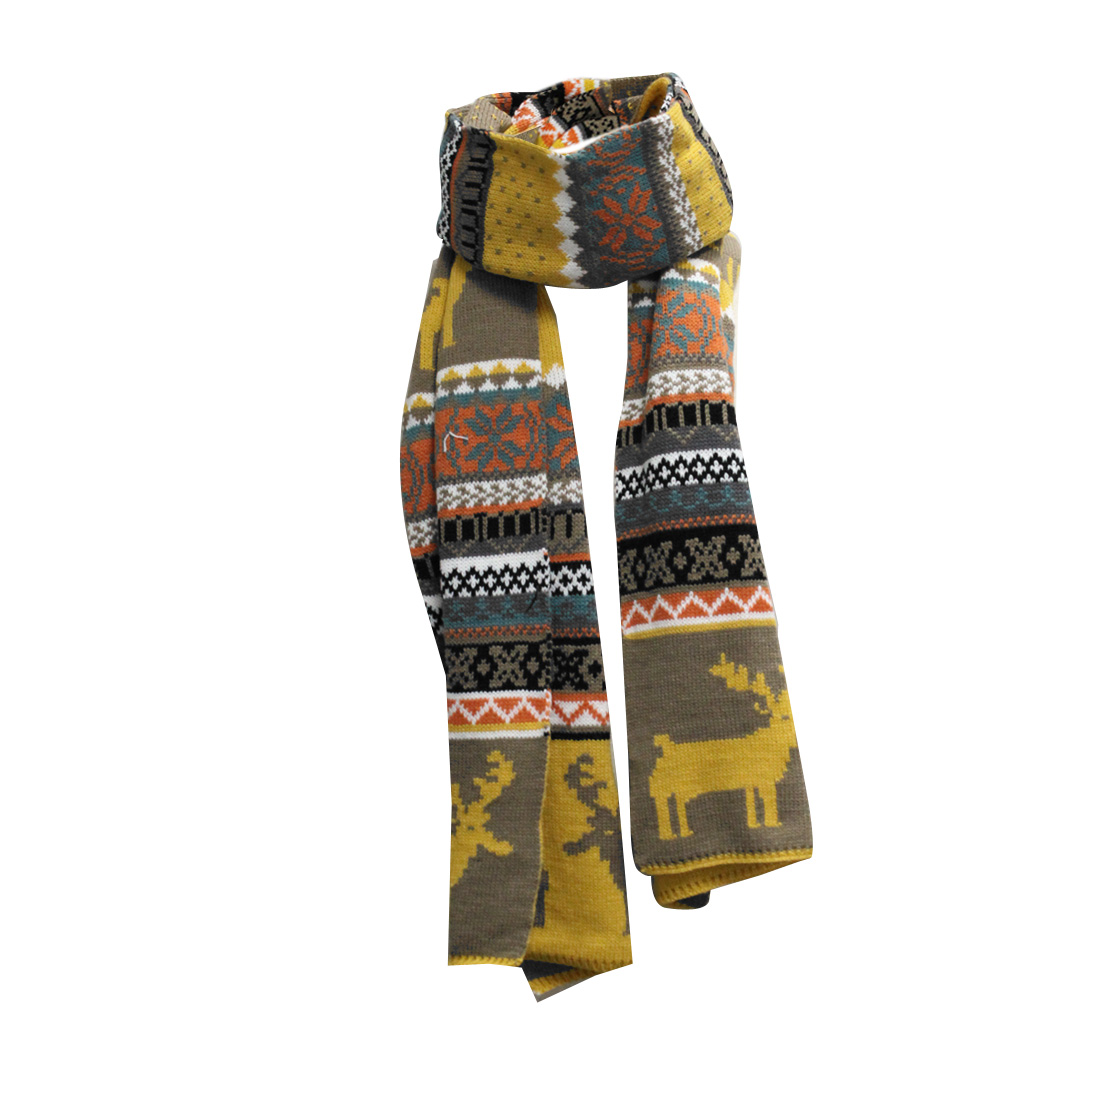 Mens Light Brown Yellow Reversible Knit Design Chrismas Fashion Scarf